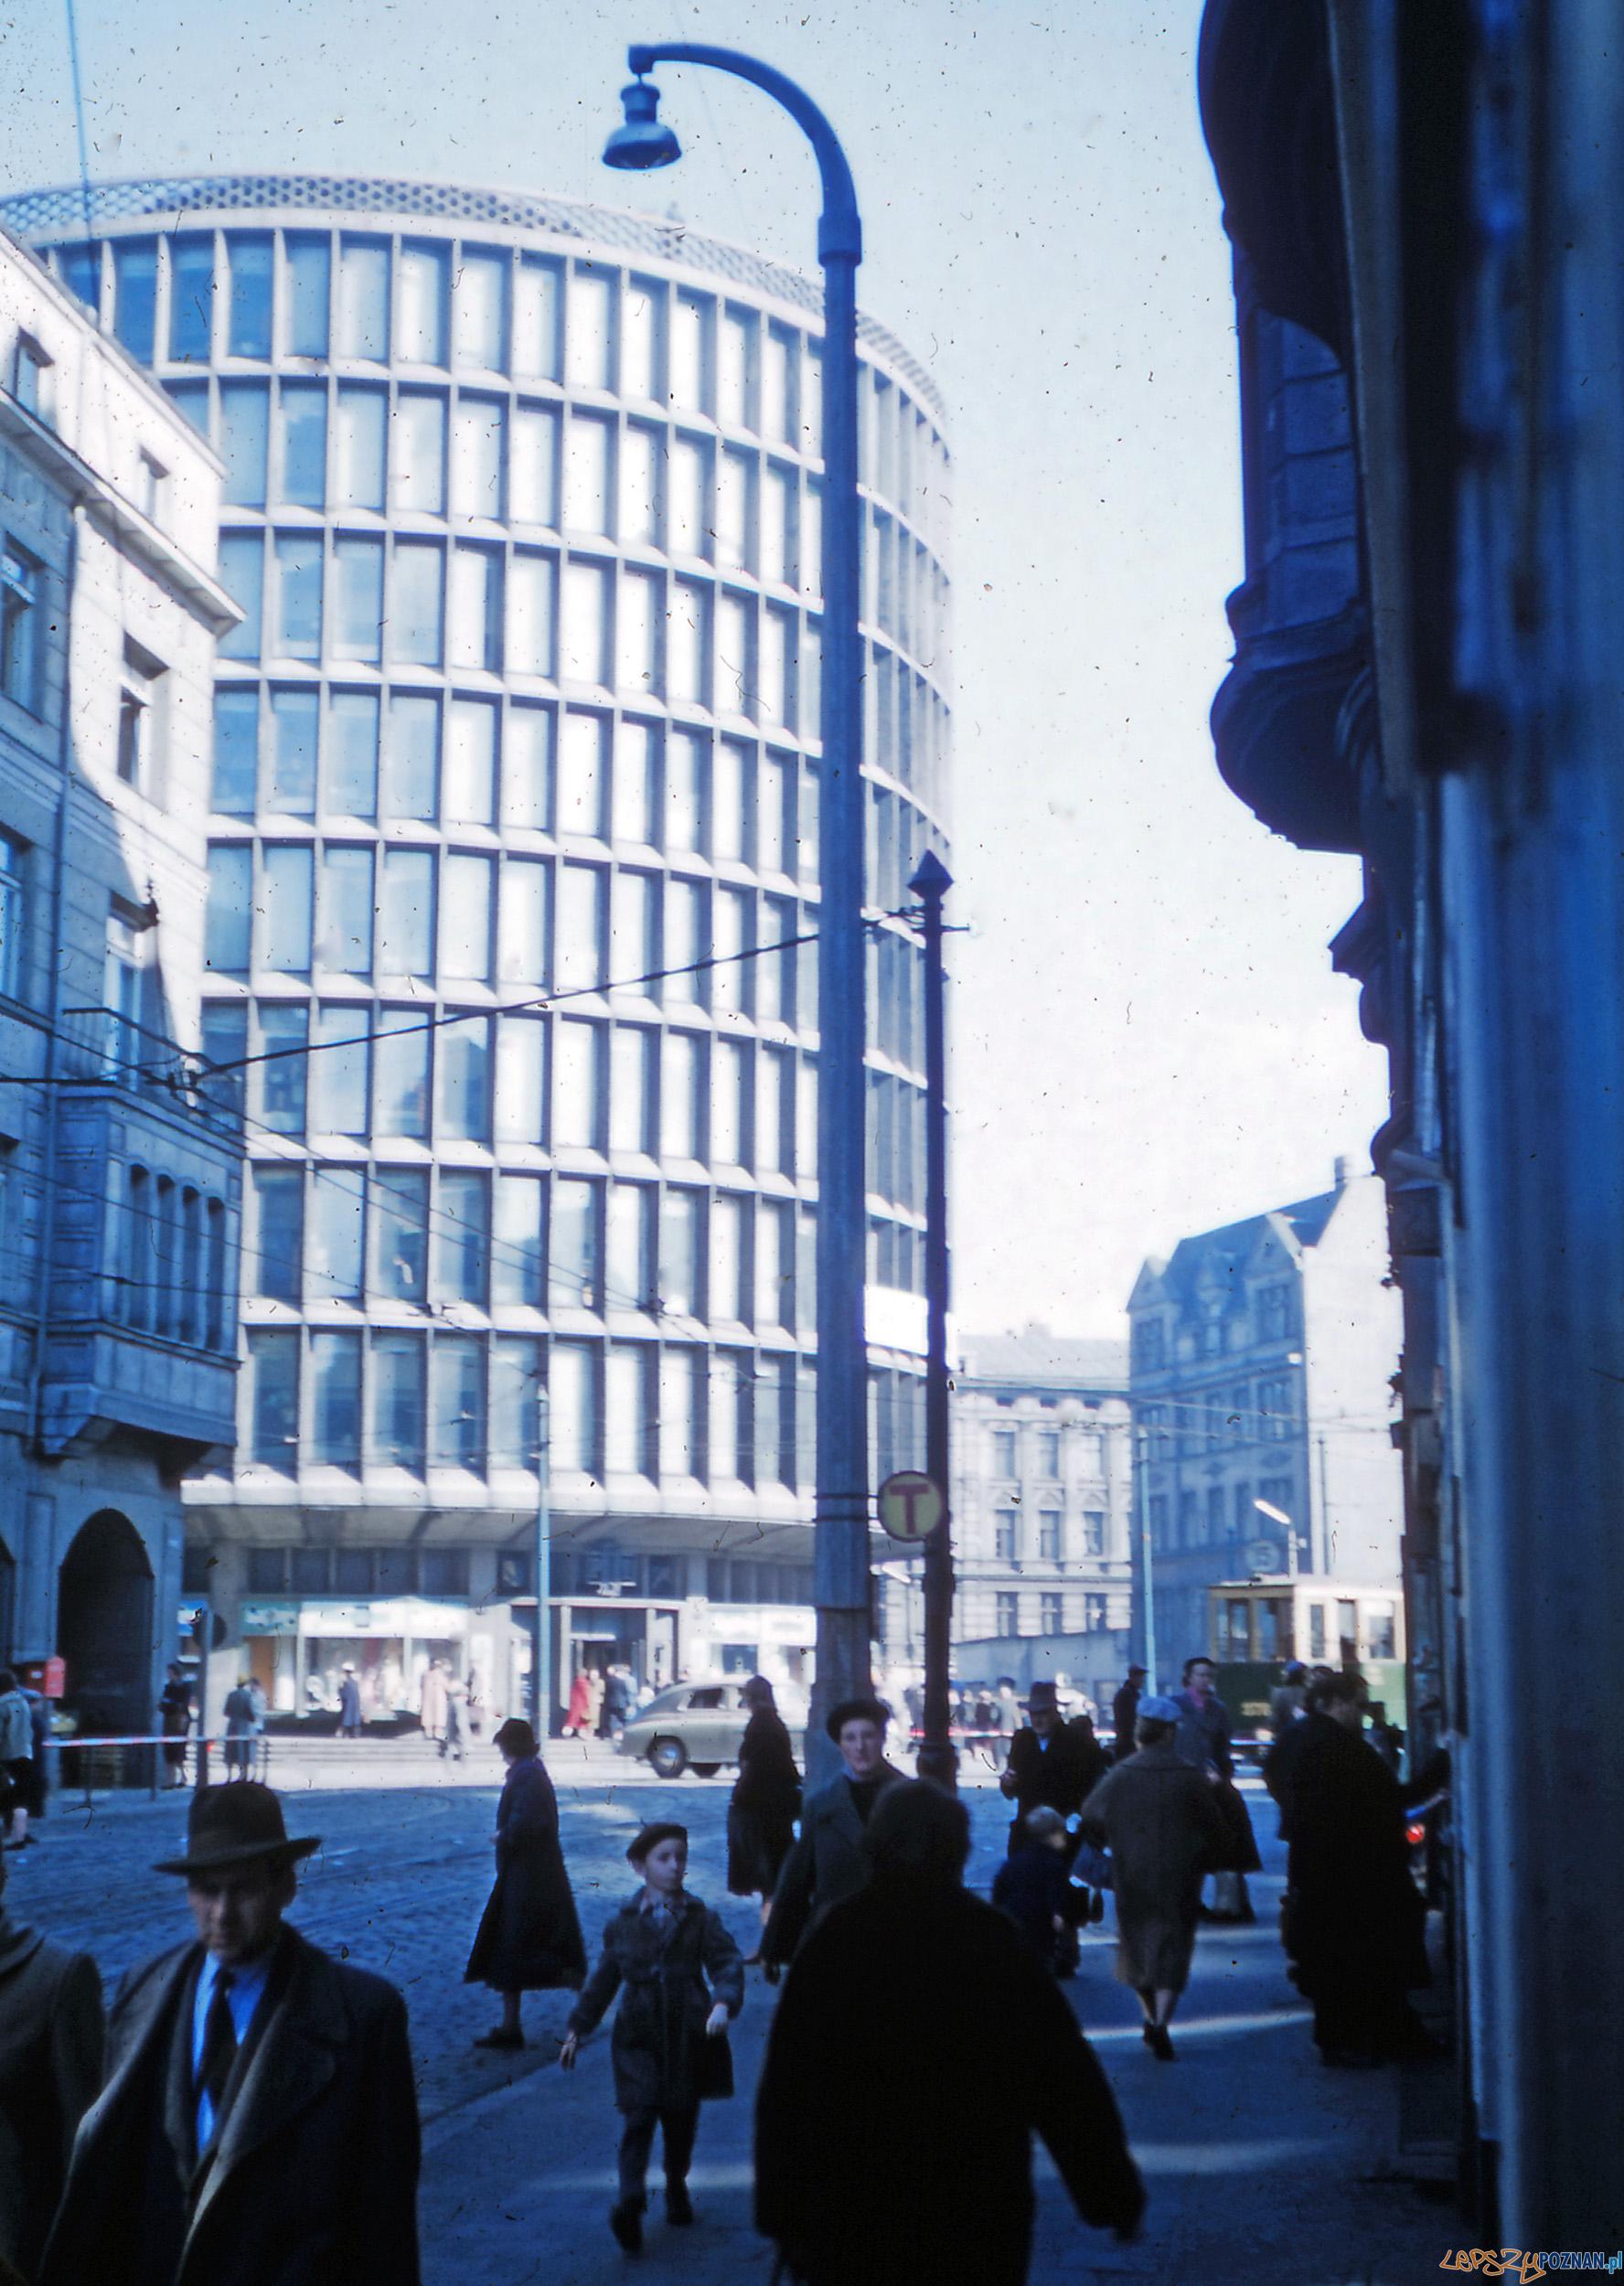 Fredry - Okrąglak - koniec lat 50-tych  Foto: Mogens Tørsleff, kolekcja Gorma Rudschinata / Flickr / CC